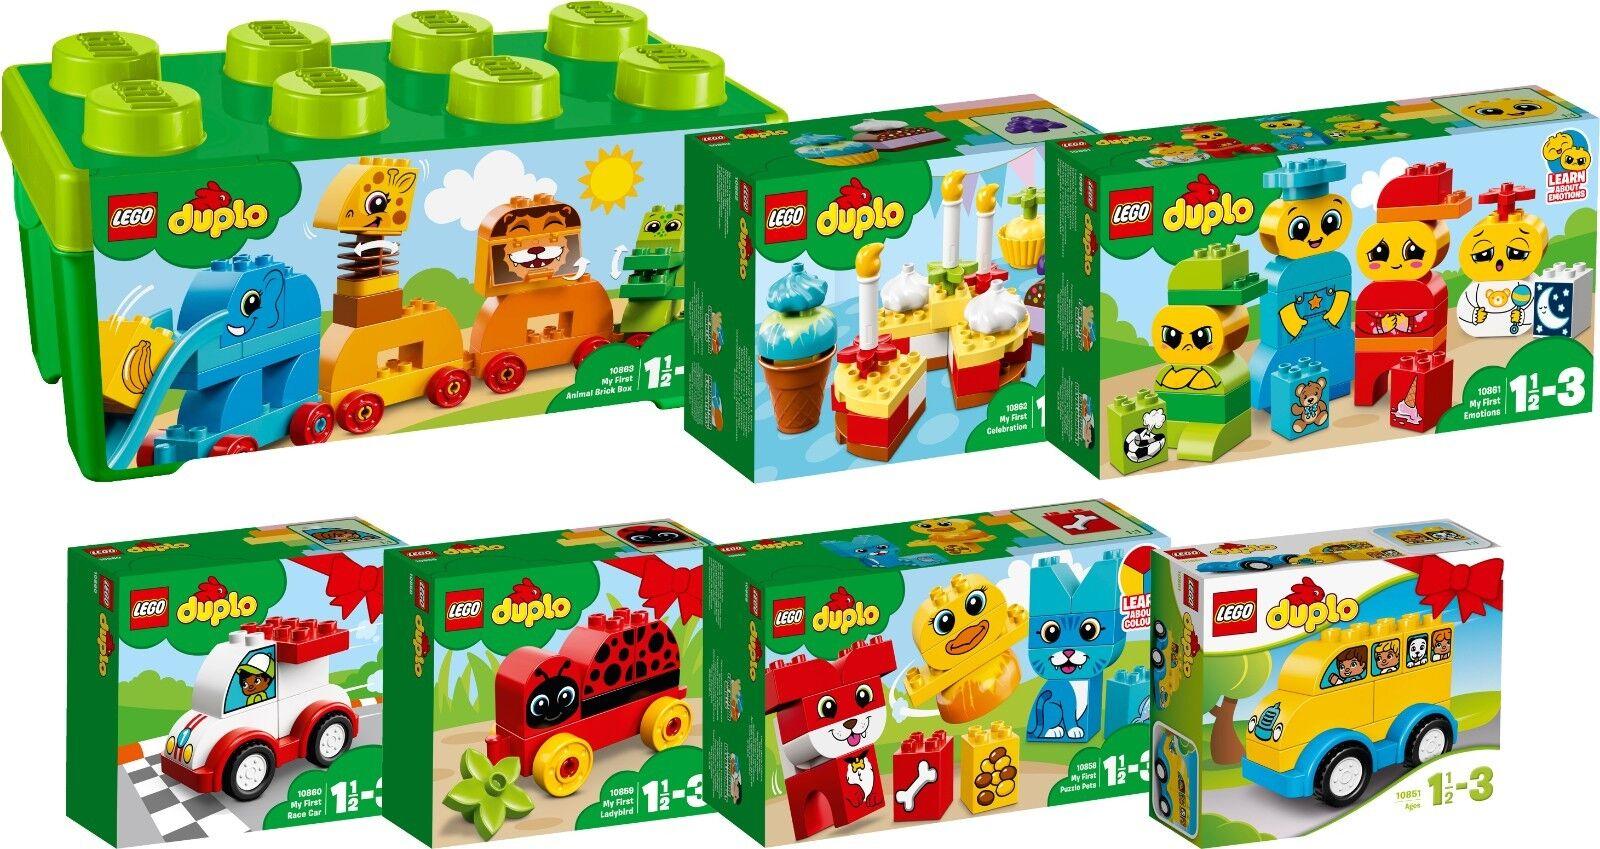 LEGO DUPLO Steine Box 10863 10862 10861 10860 10859 10858 10851 N1/18